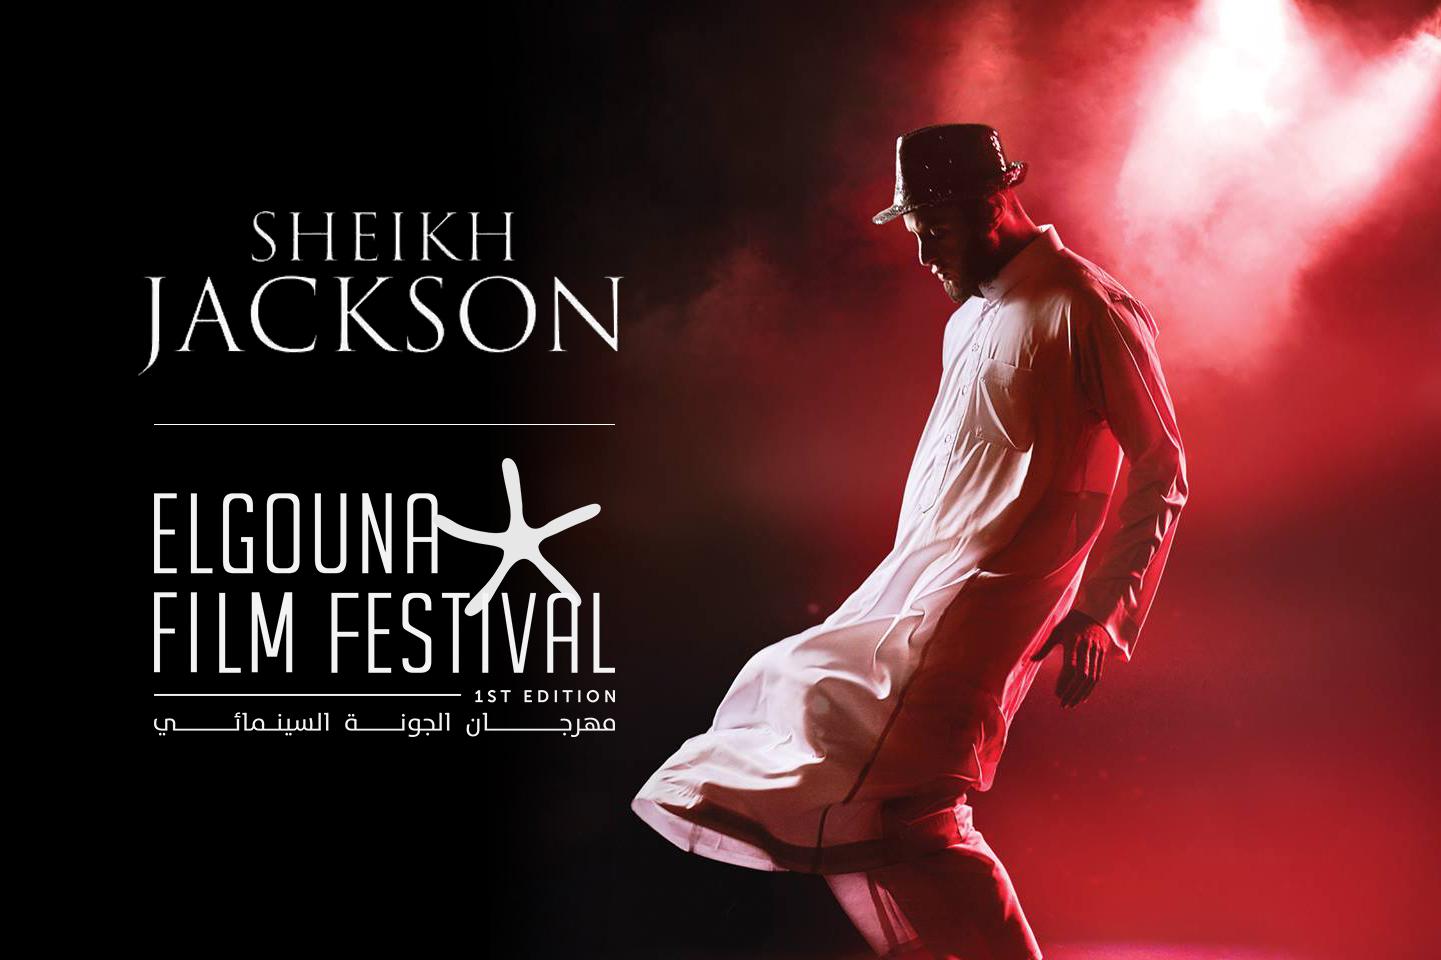 Sheikh jackson Poster_الشيخ جاكسون